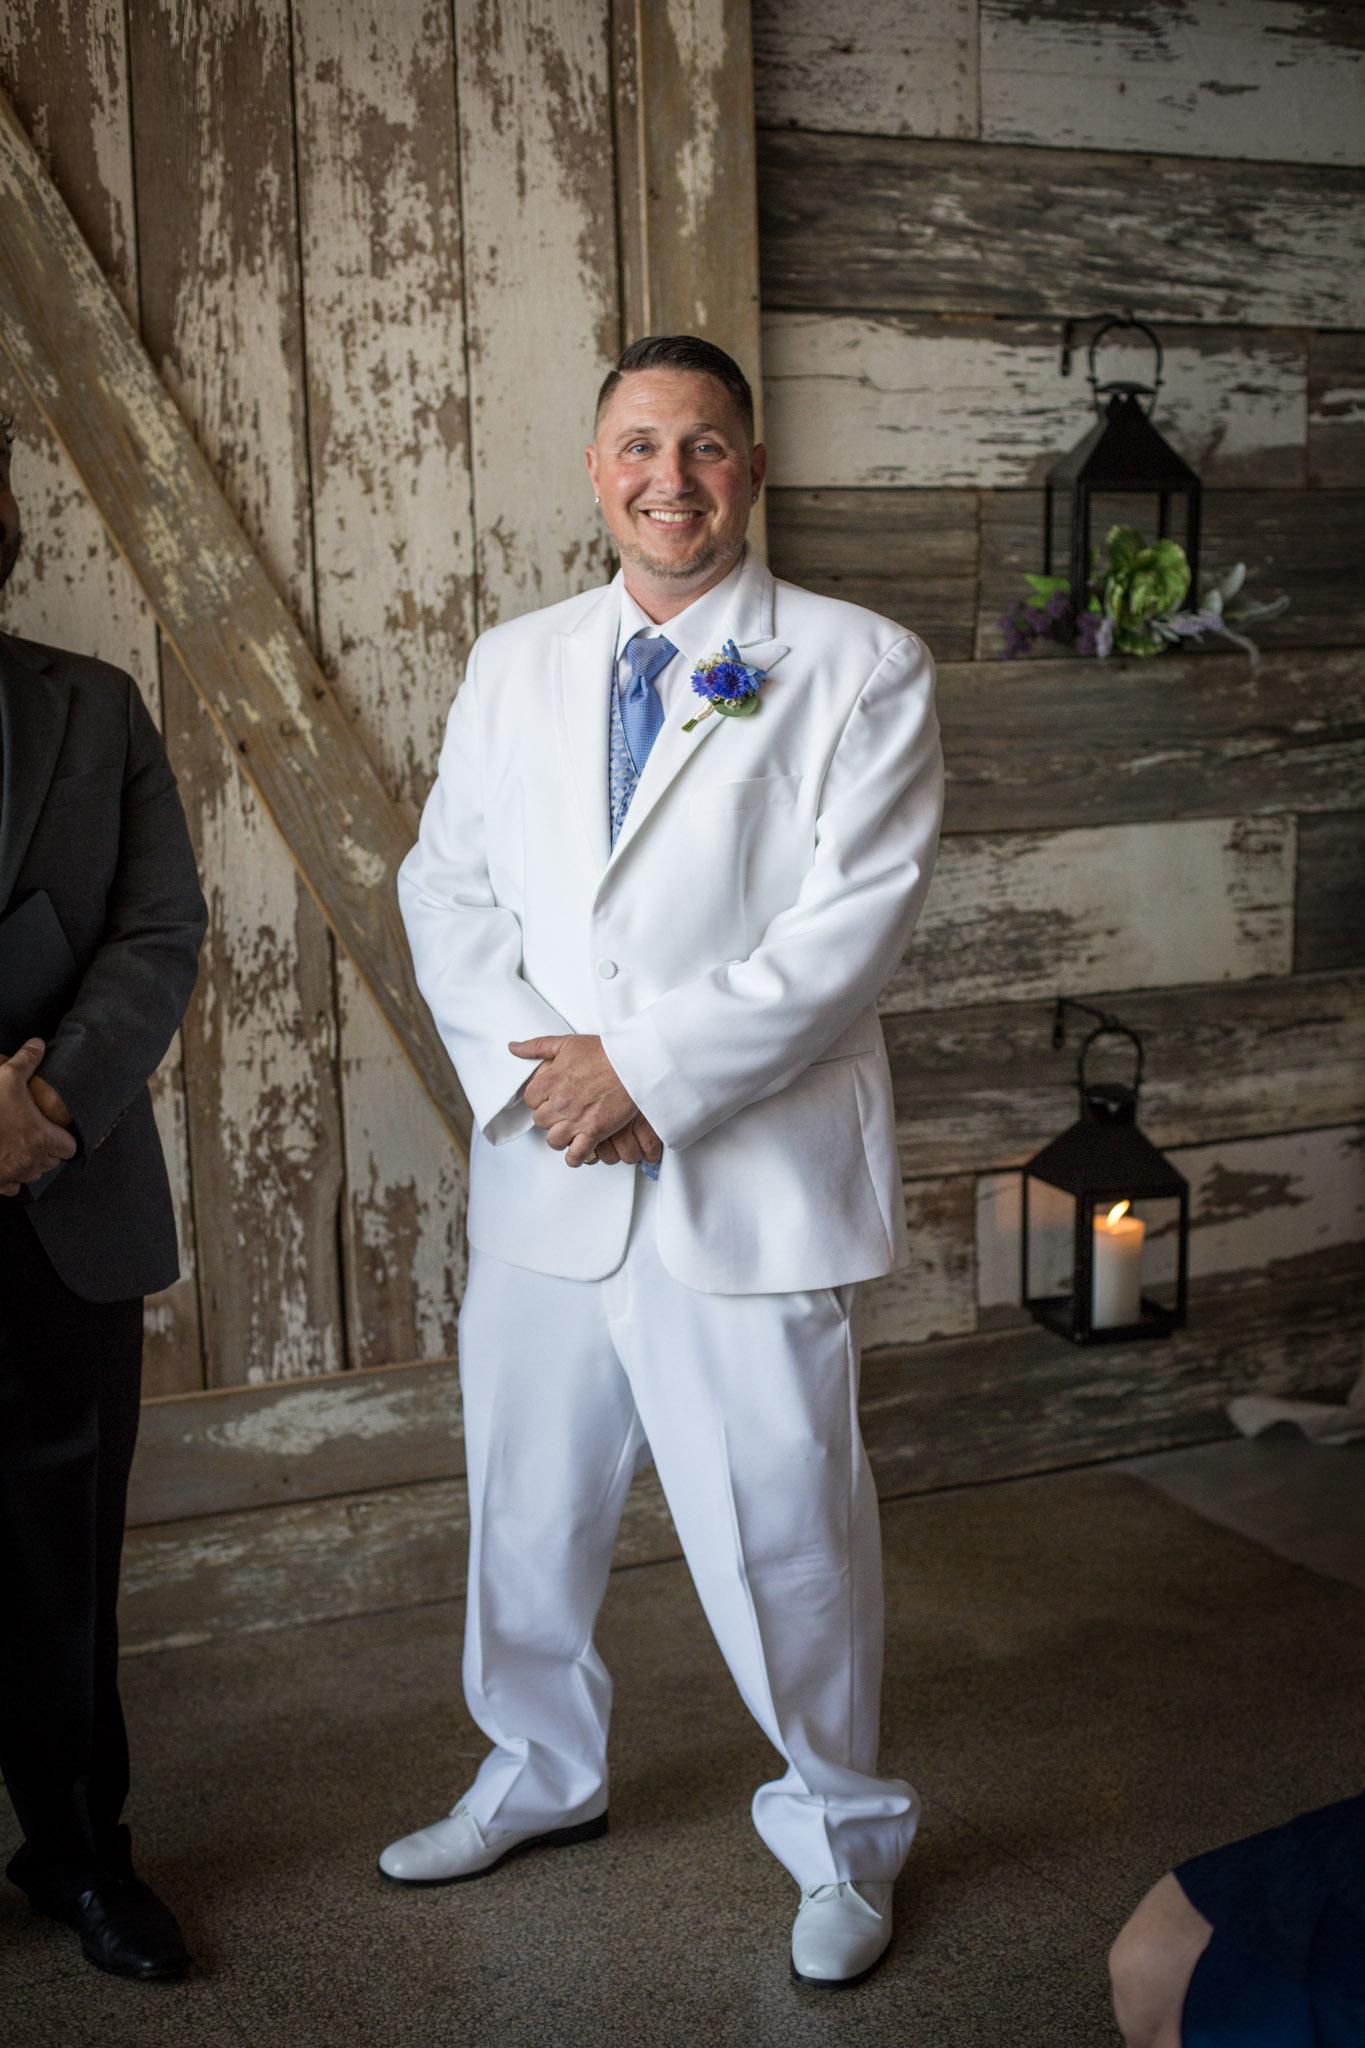 The_Vow_Exchange_Kansas_City_Small_Budget_Wedding_Venue_Mico&Daniel-052.jpg